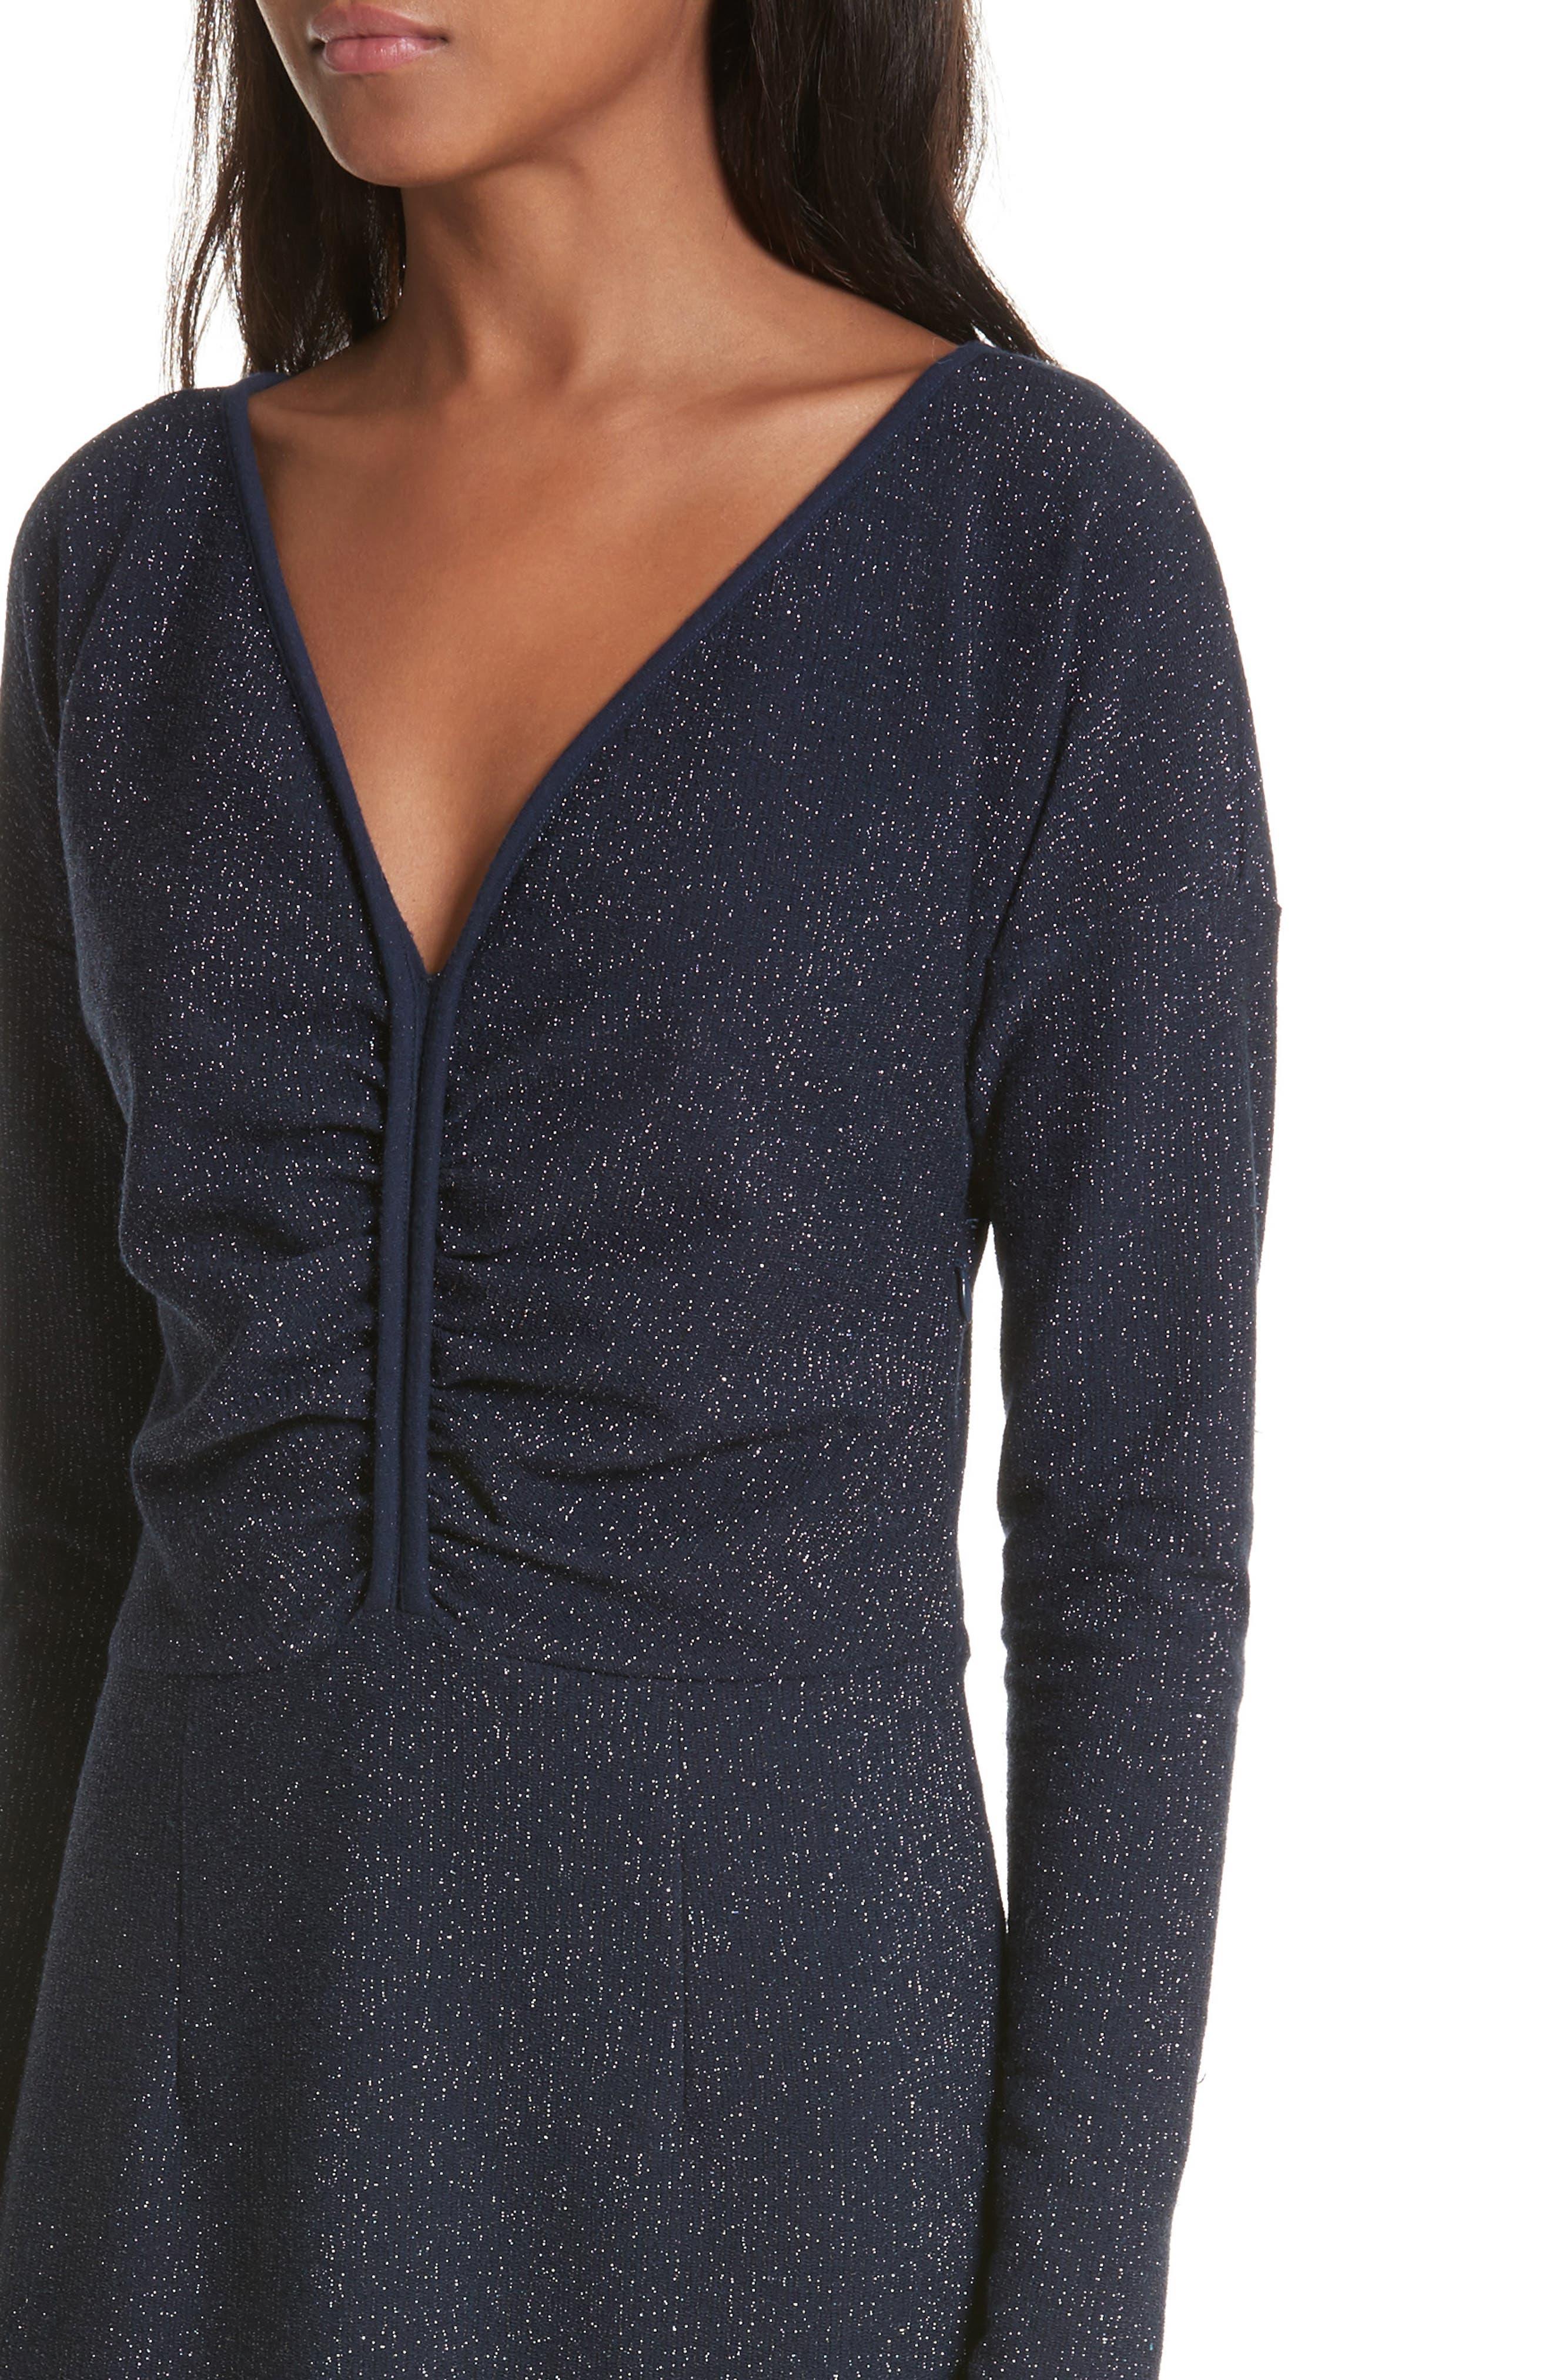 Temper Metallic Knit Dress,                             Alternate thumbnail 4, color,                             401